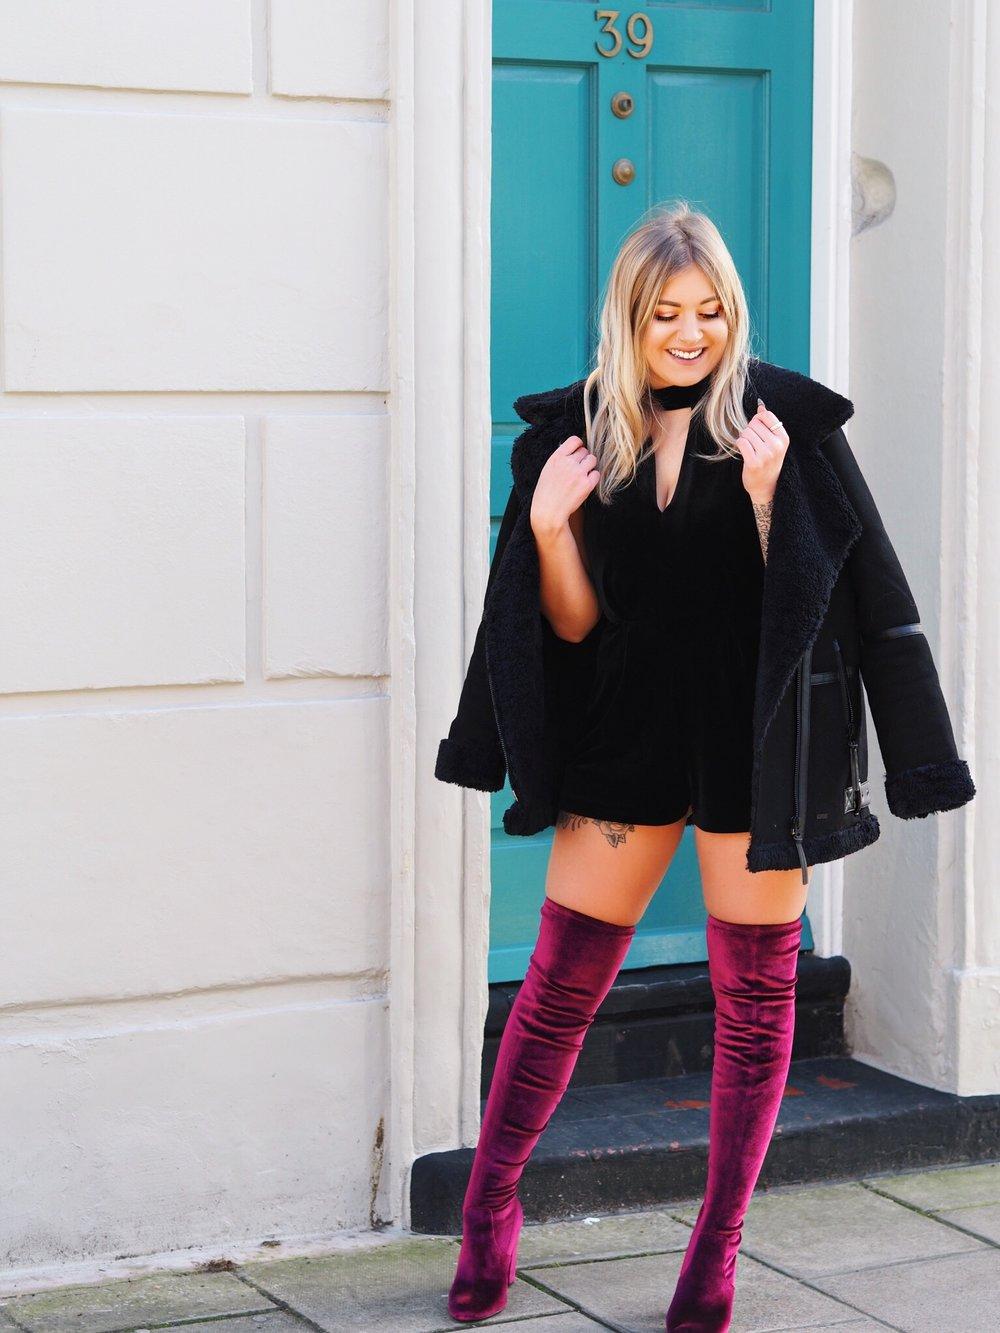 Brighton fashion blogger